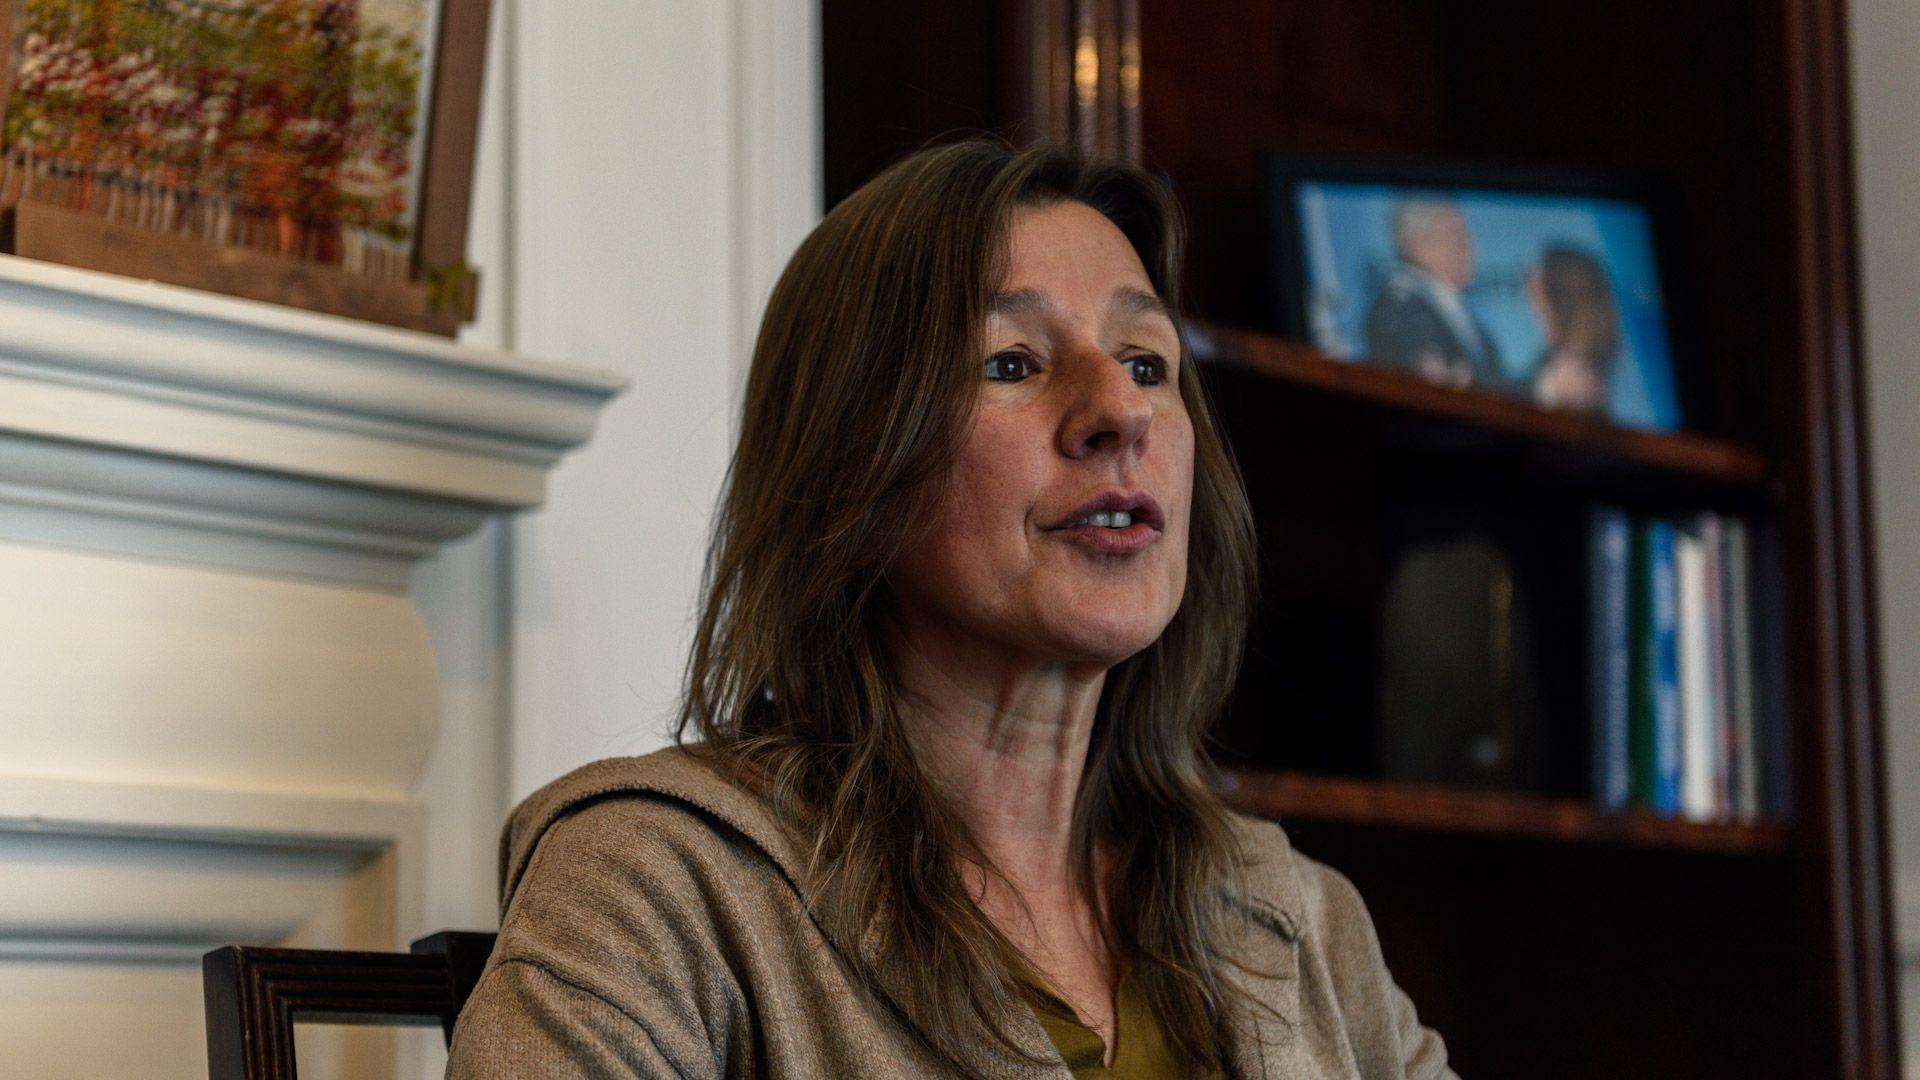 Ministra de seguridad Sabina Frederic